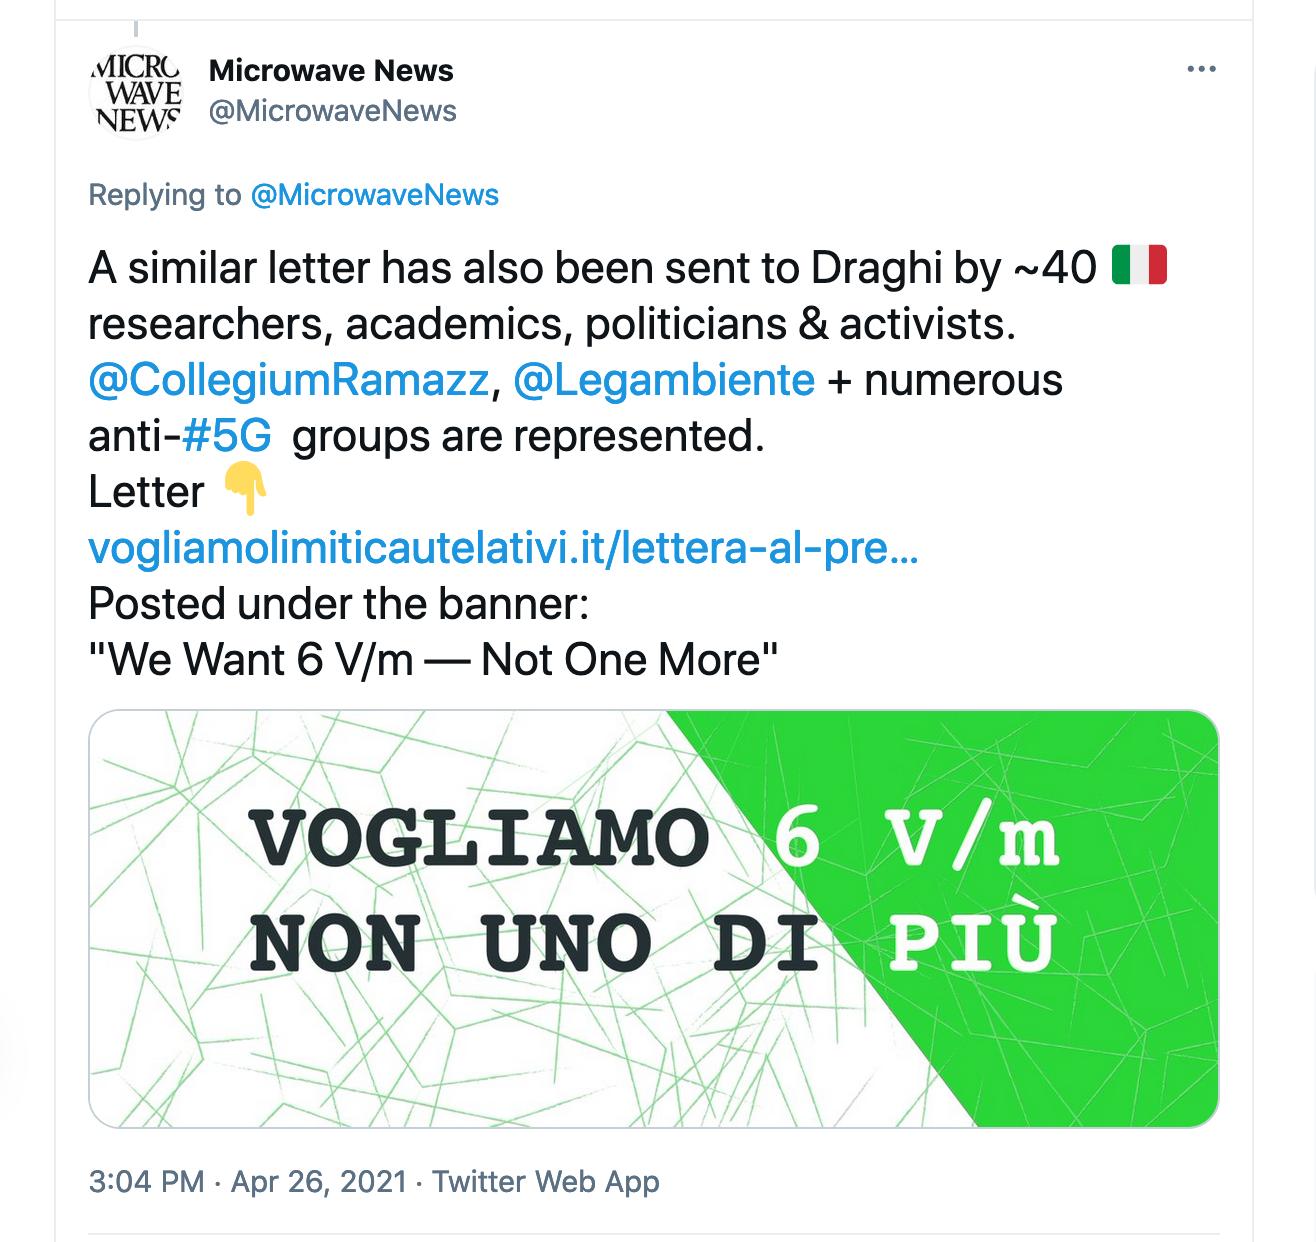 Microwave News Tweet on Italy 6 V/m Limit, Pt2